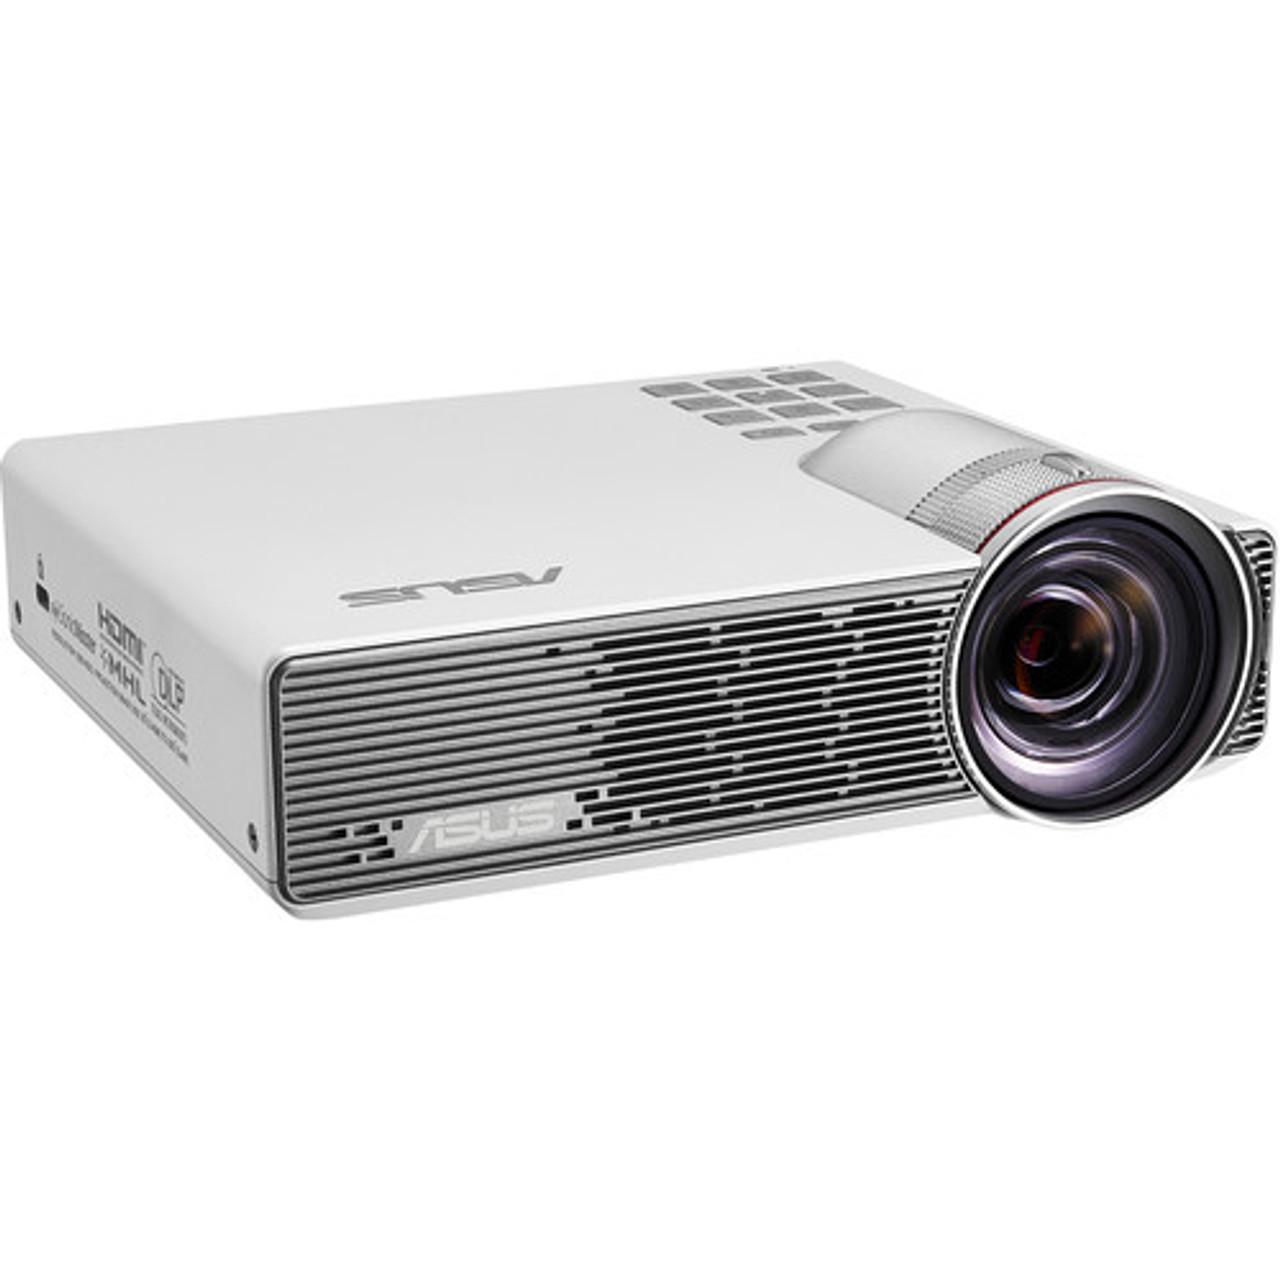 ASUS A90LJ0070-B00140-R P3B WXGA DLP Portable Projector - Certified Refurbished